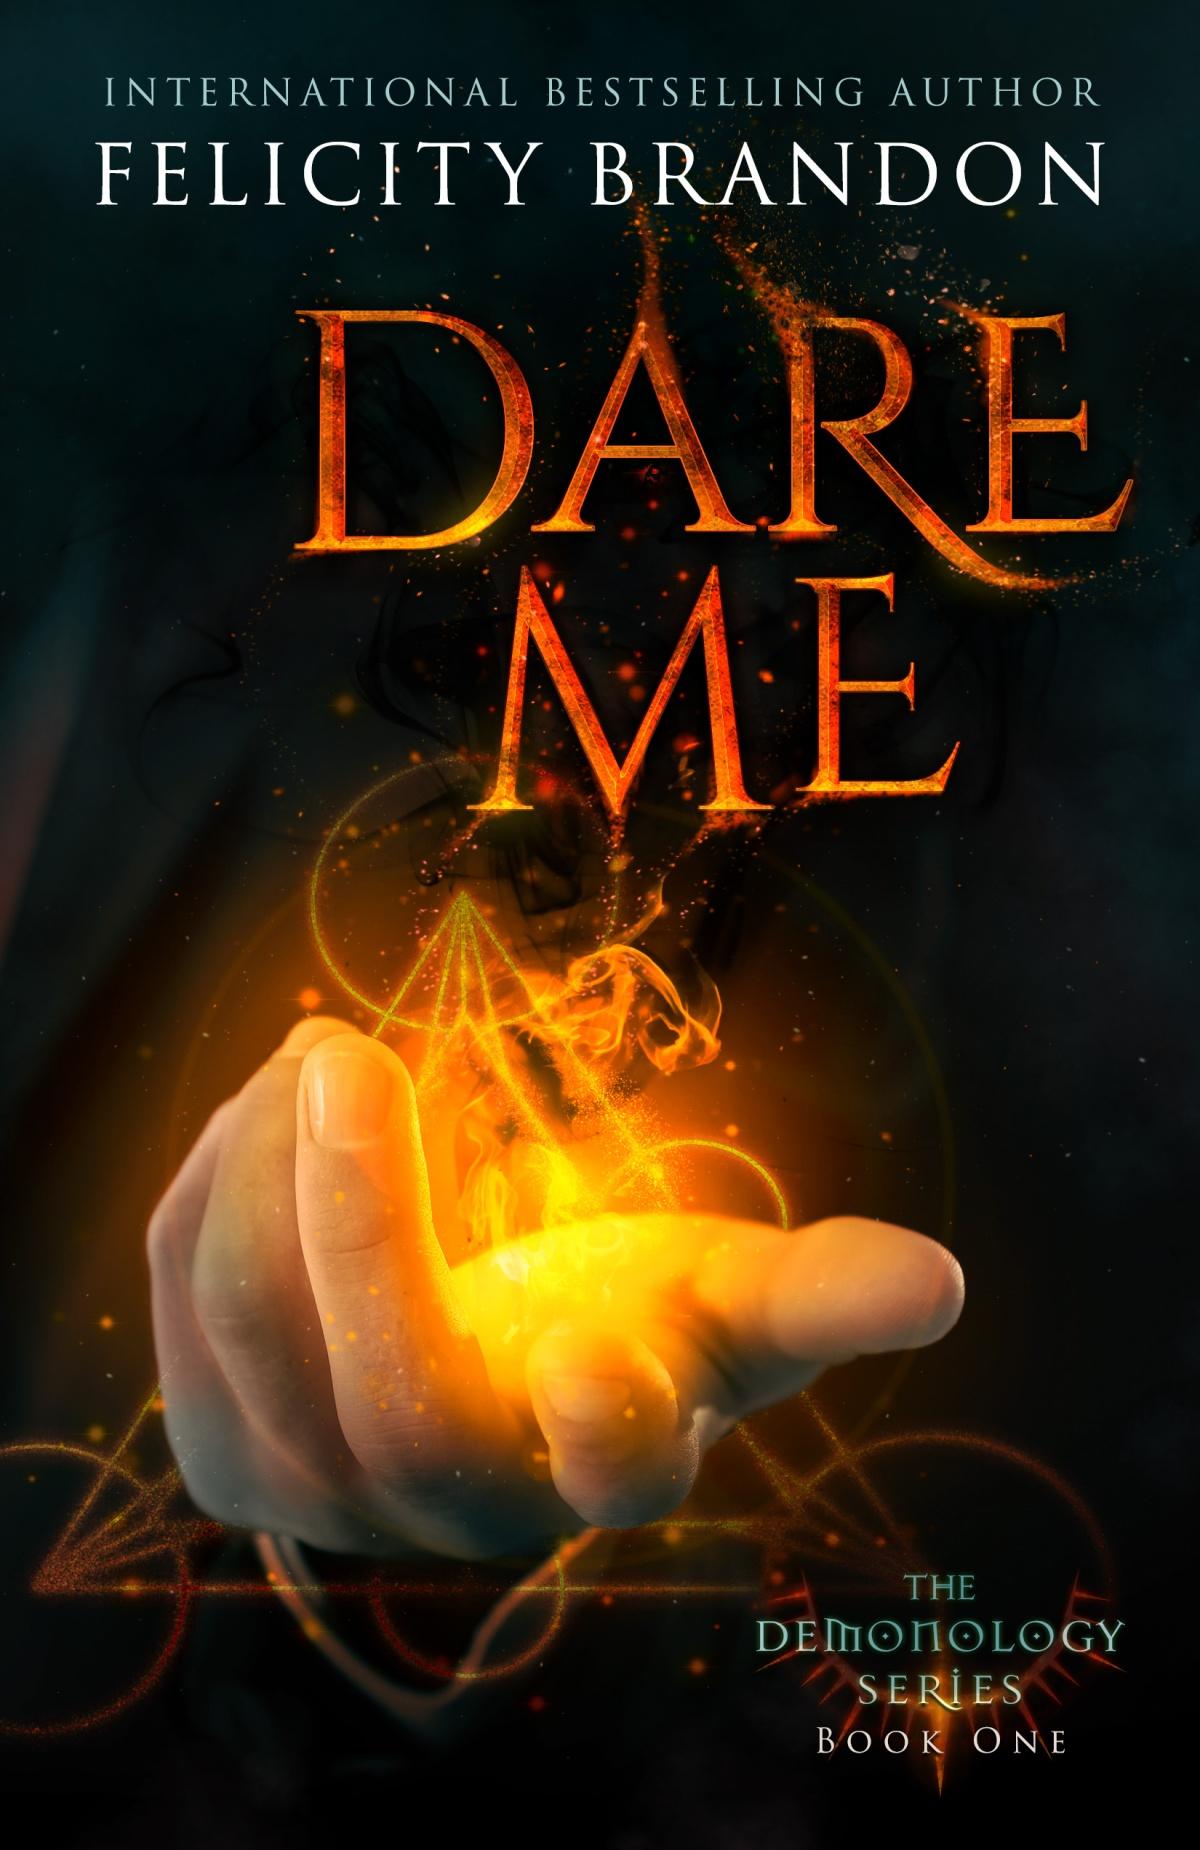 New release Dare Me by FelicityBrandon